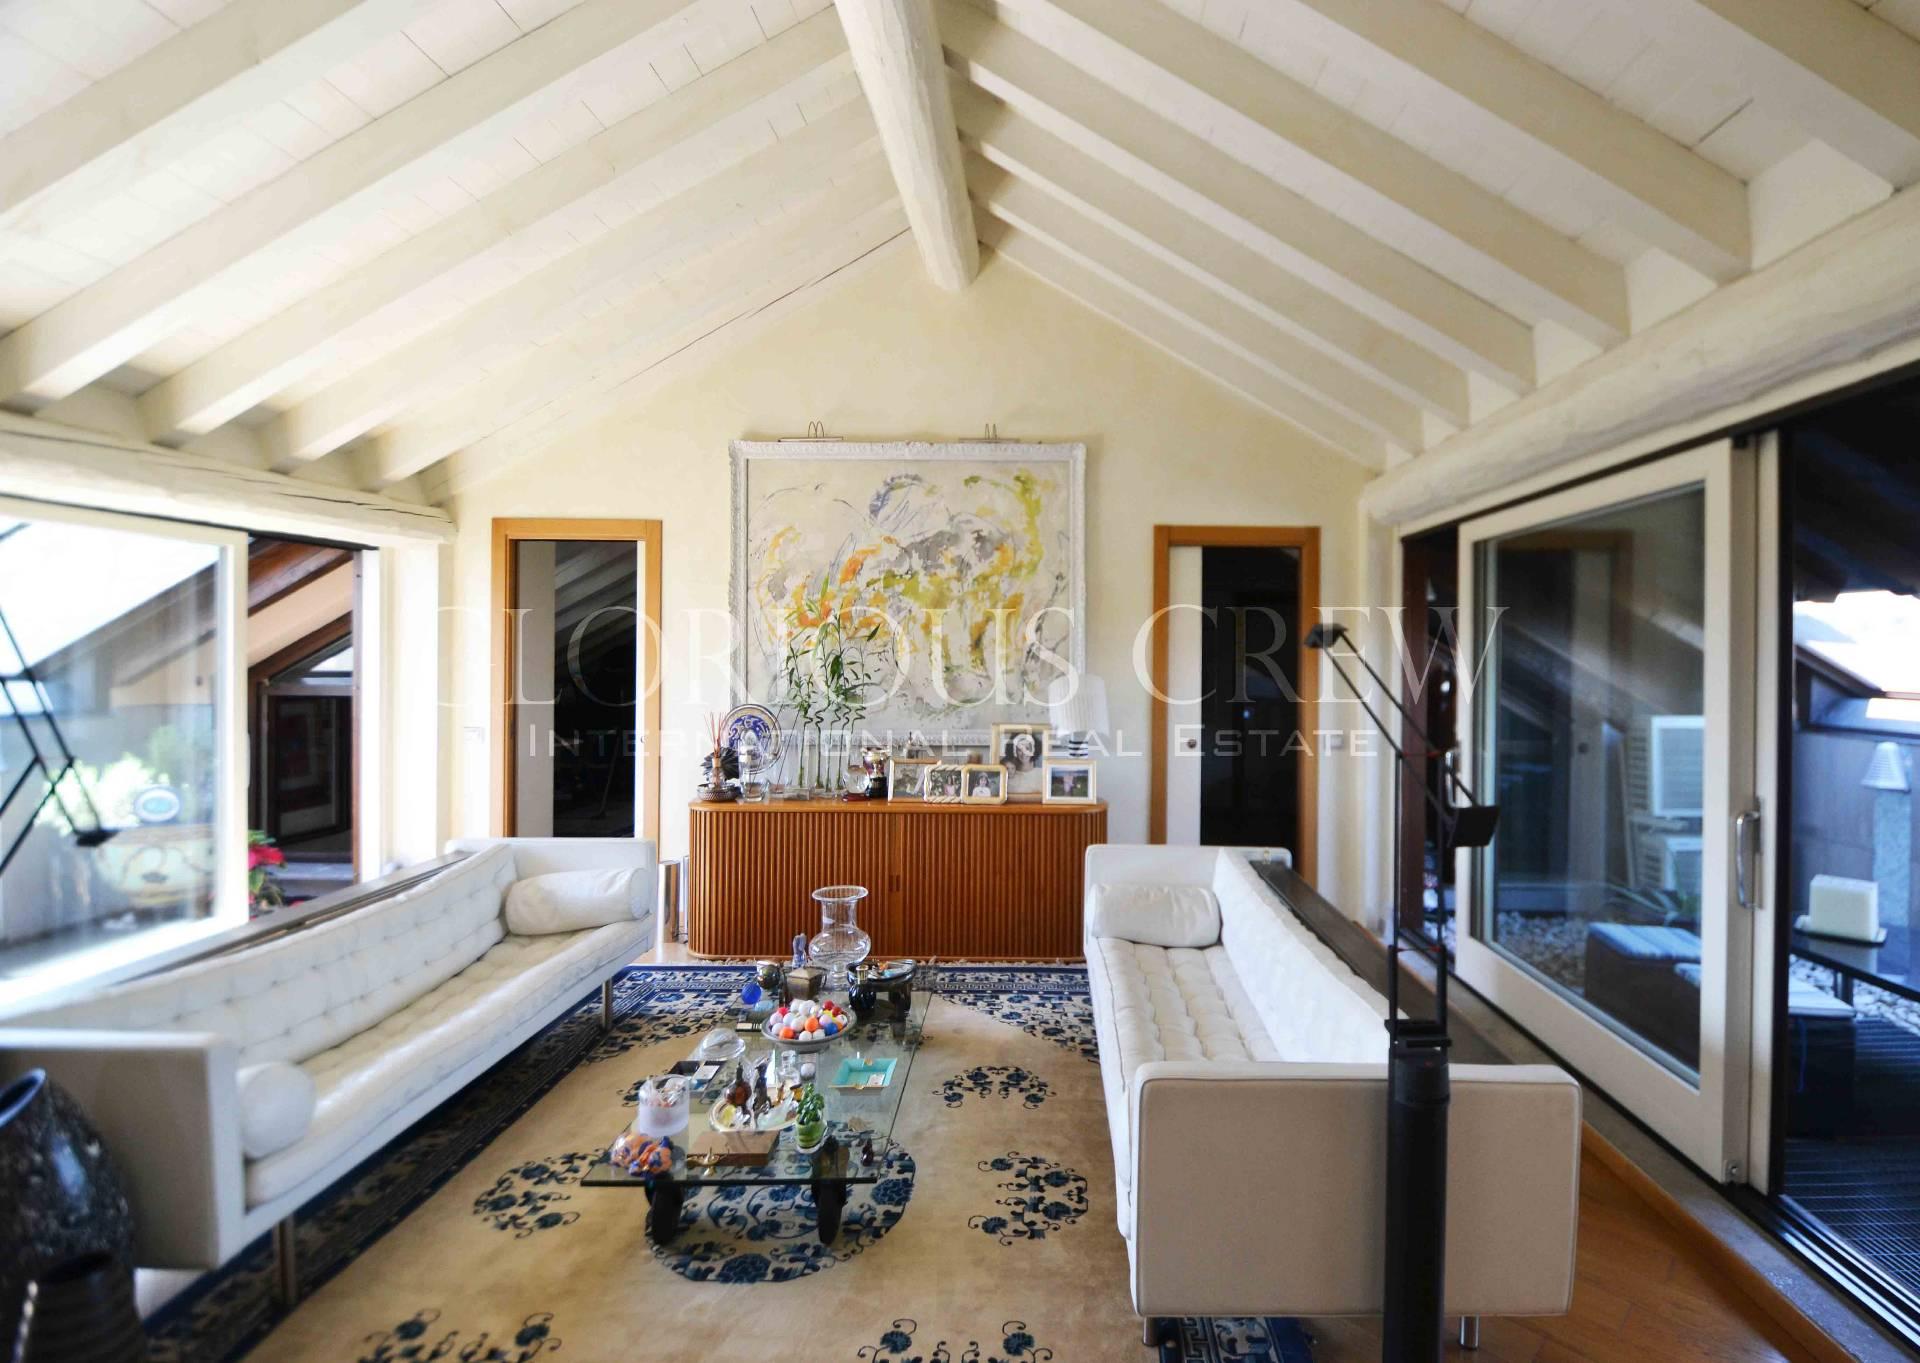 Pieve Emanuele | Appartamento in Vendita in Via Fizzonasco | lacasadimilano.it